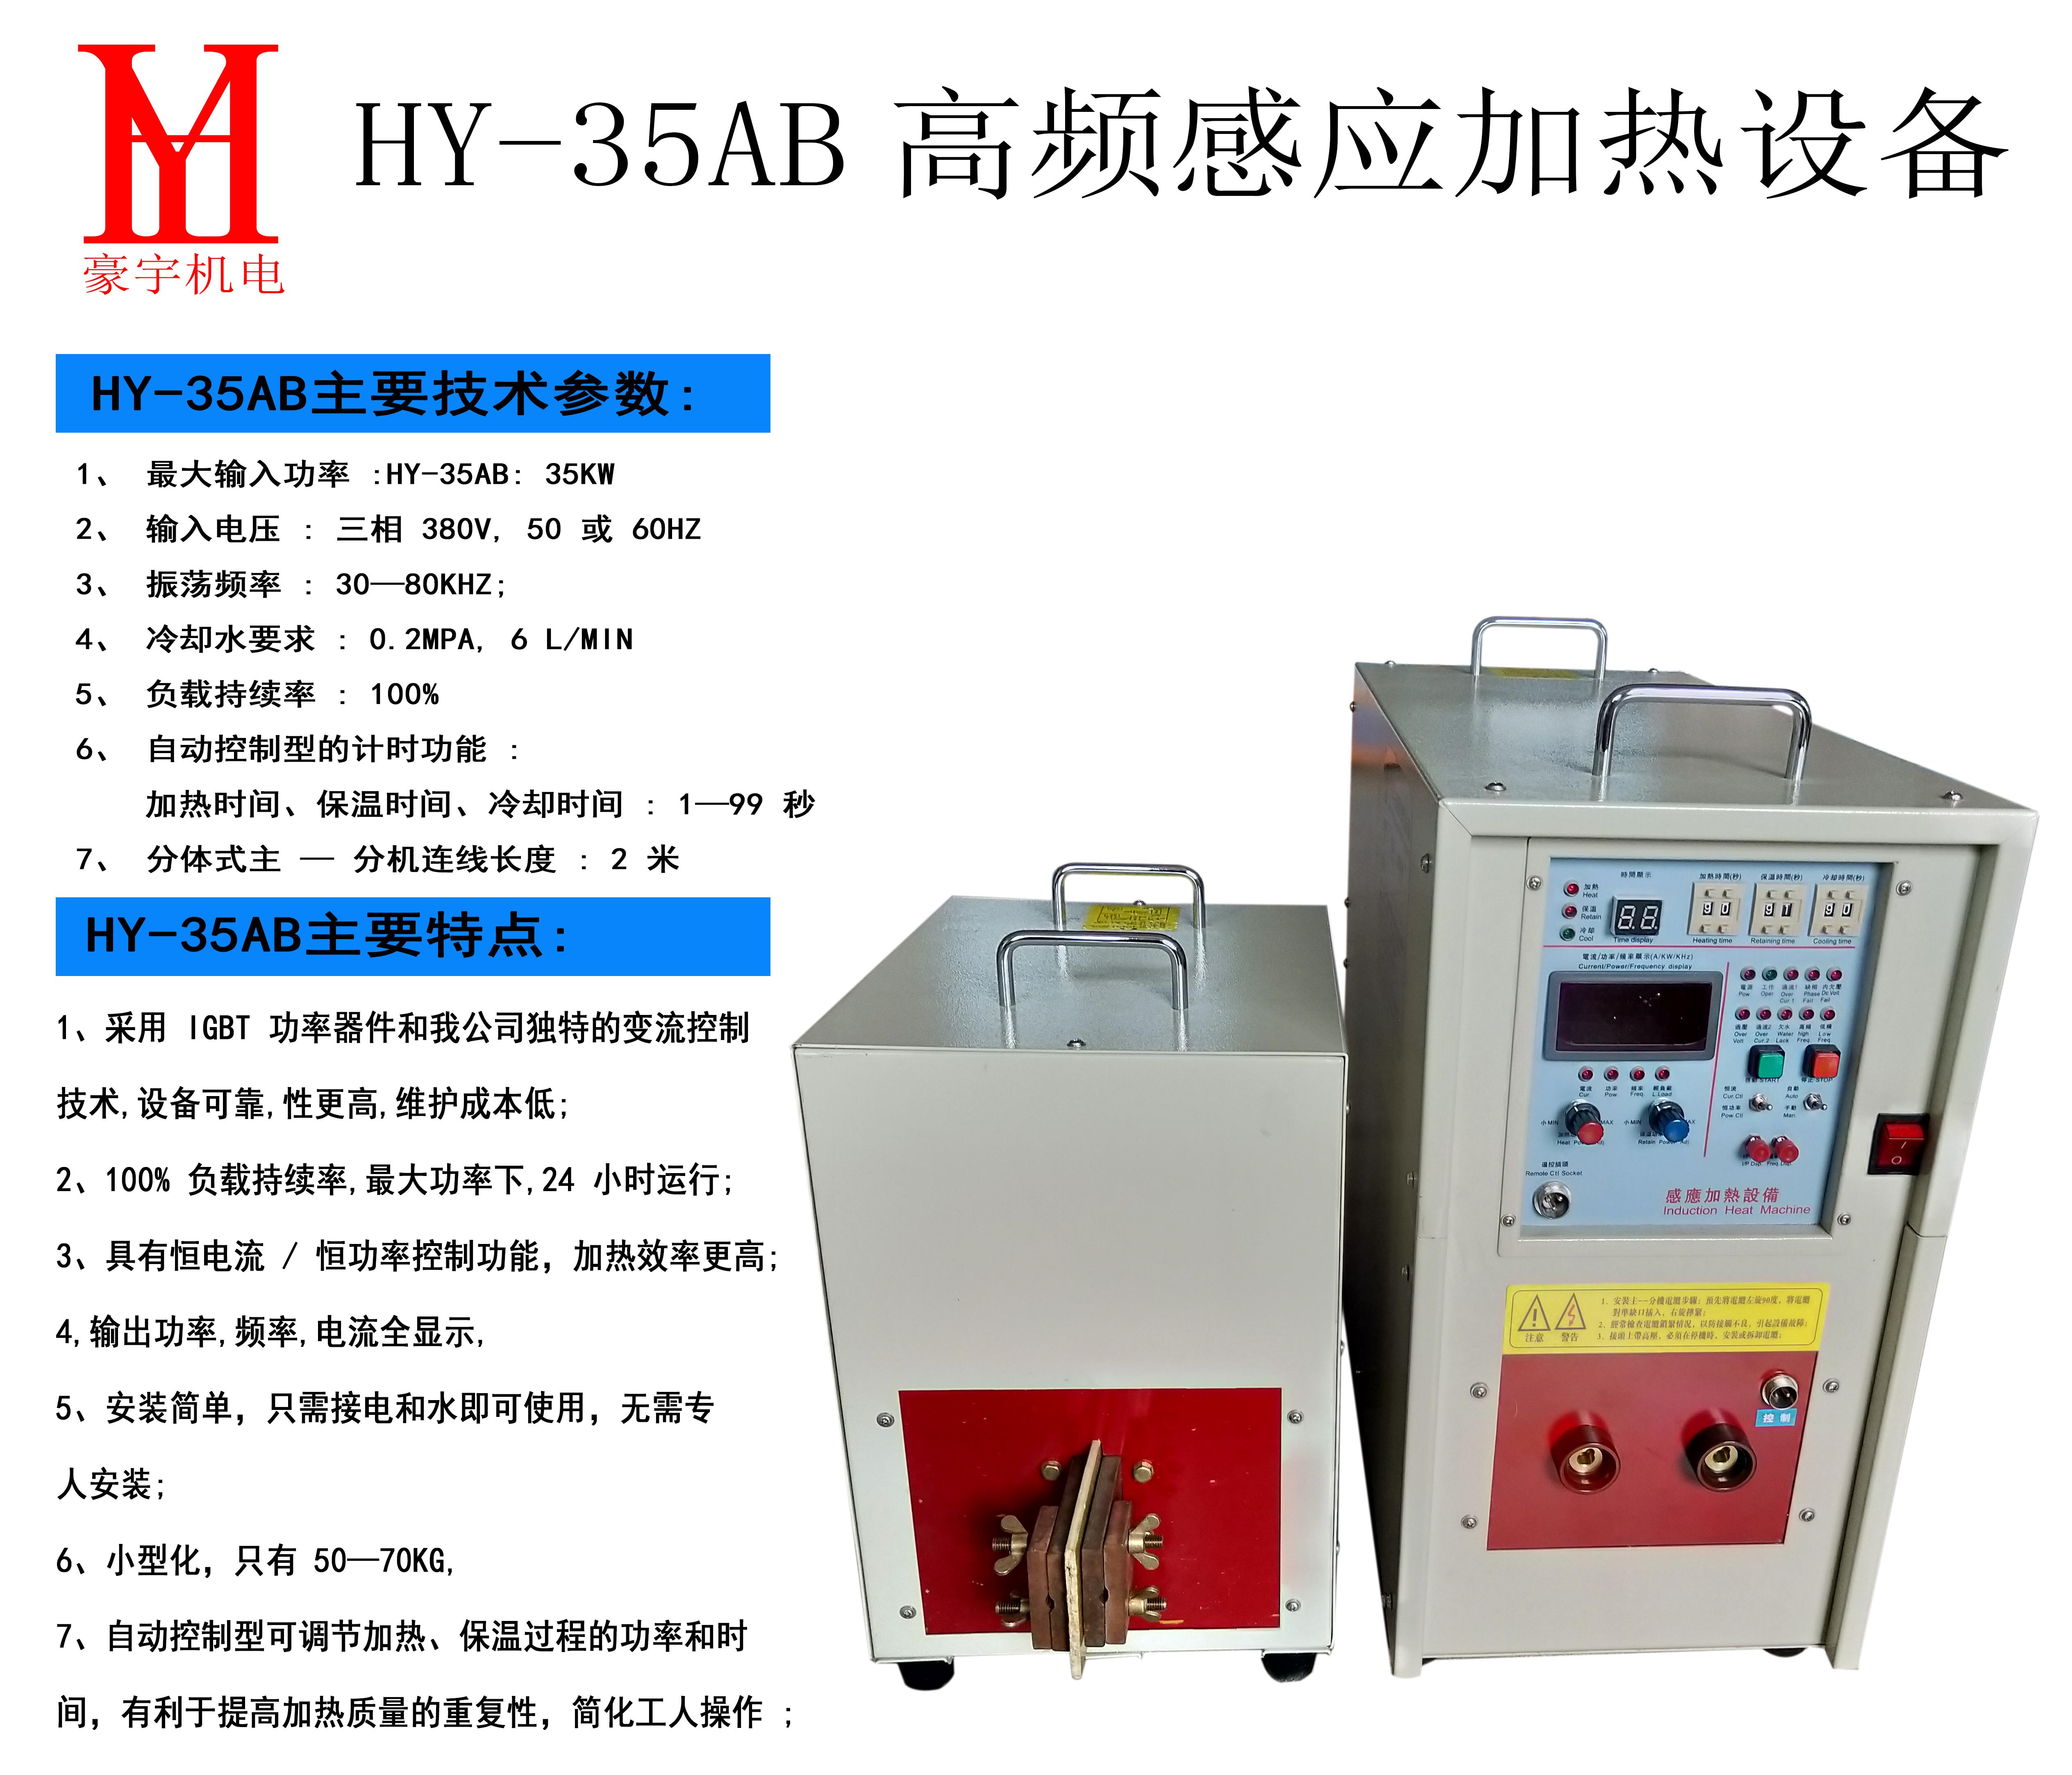 WDS-35AB技术参数